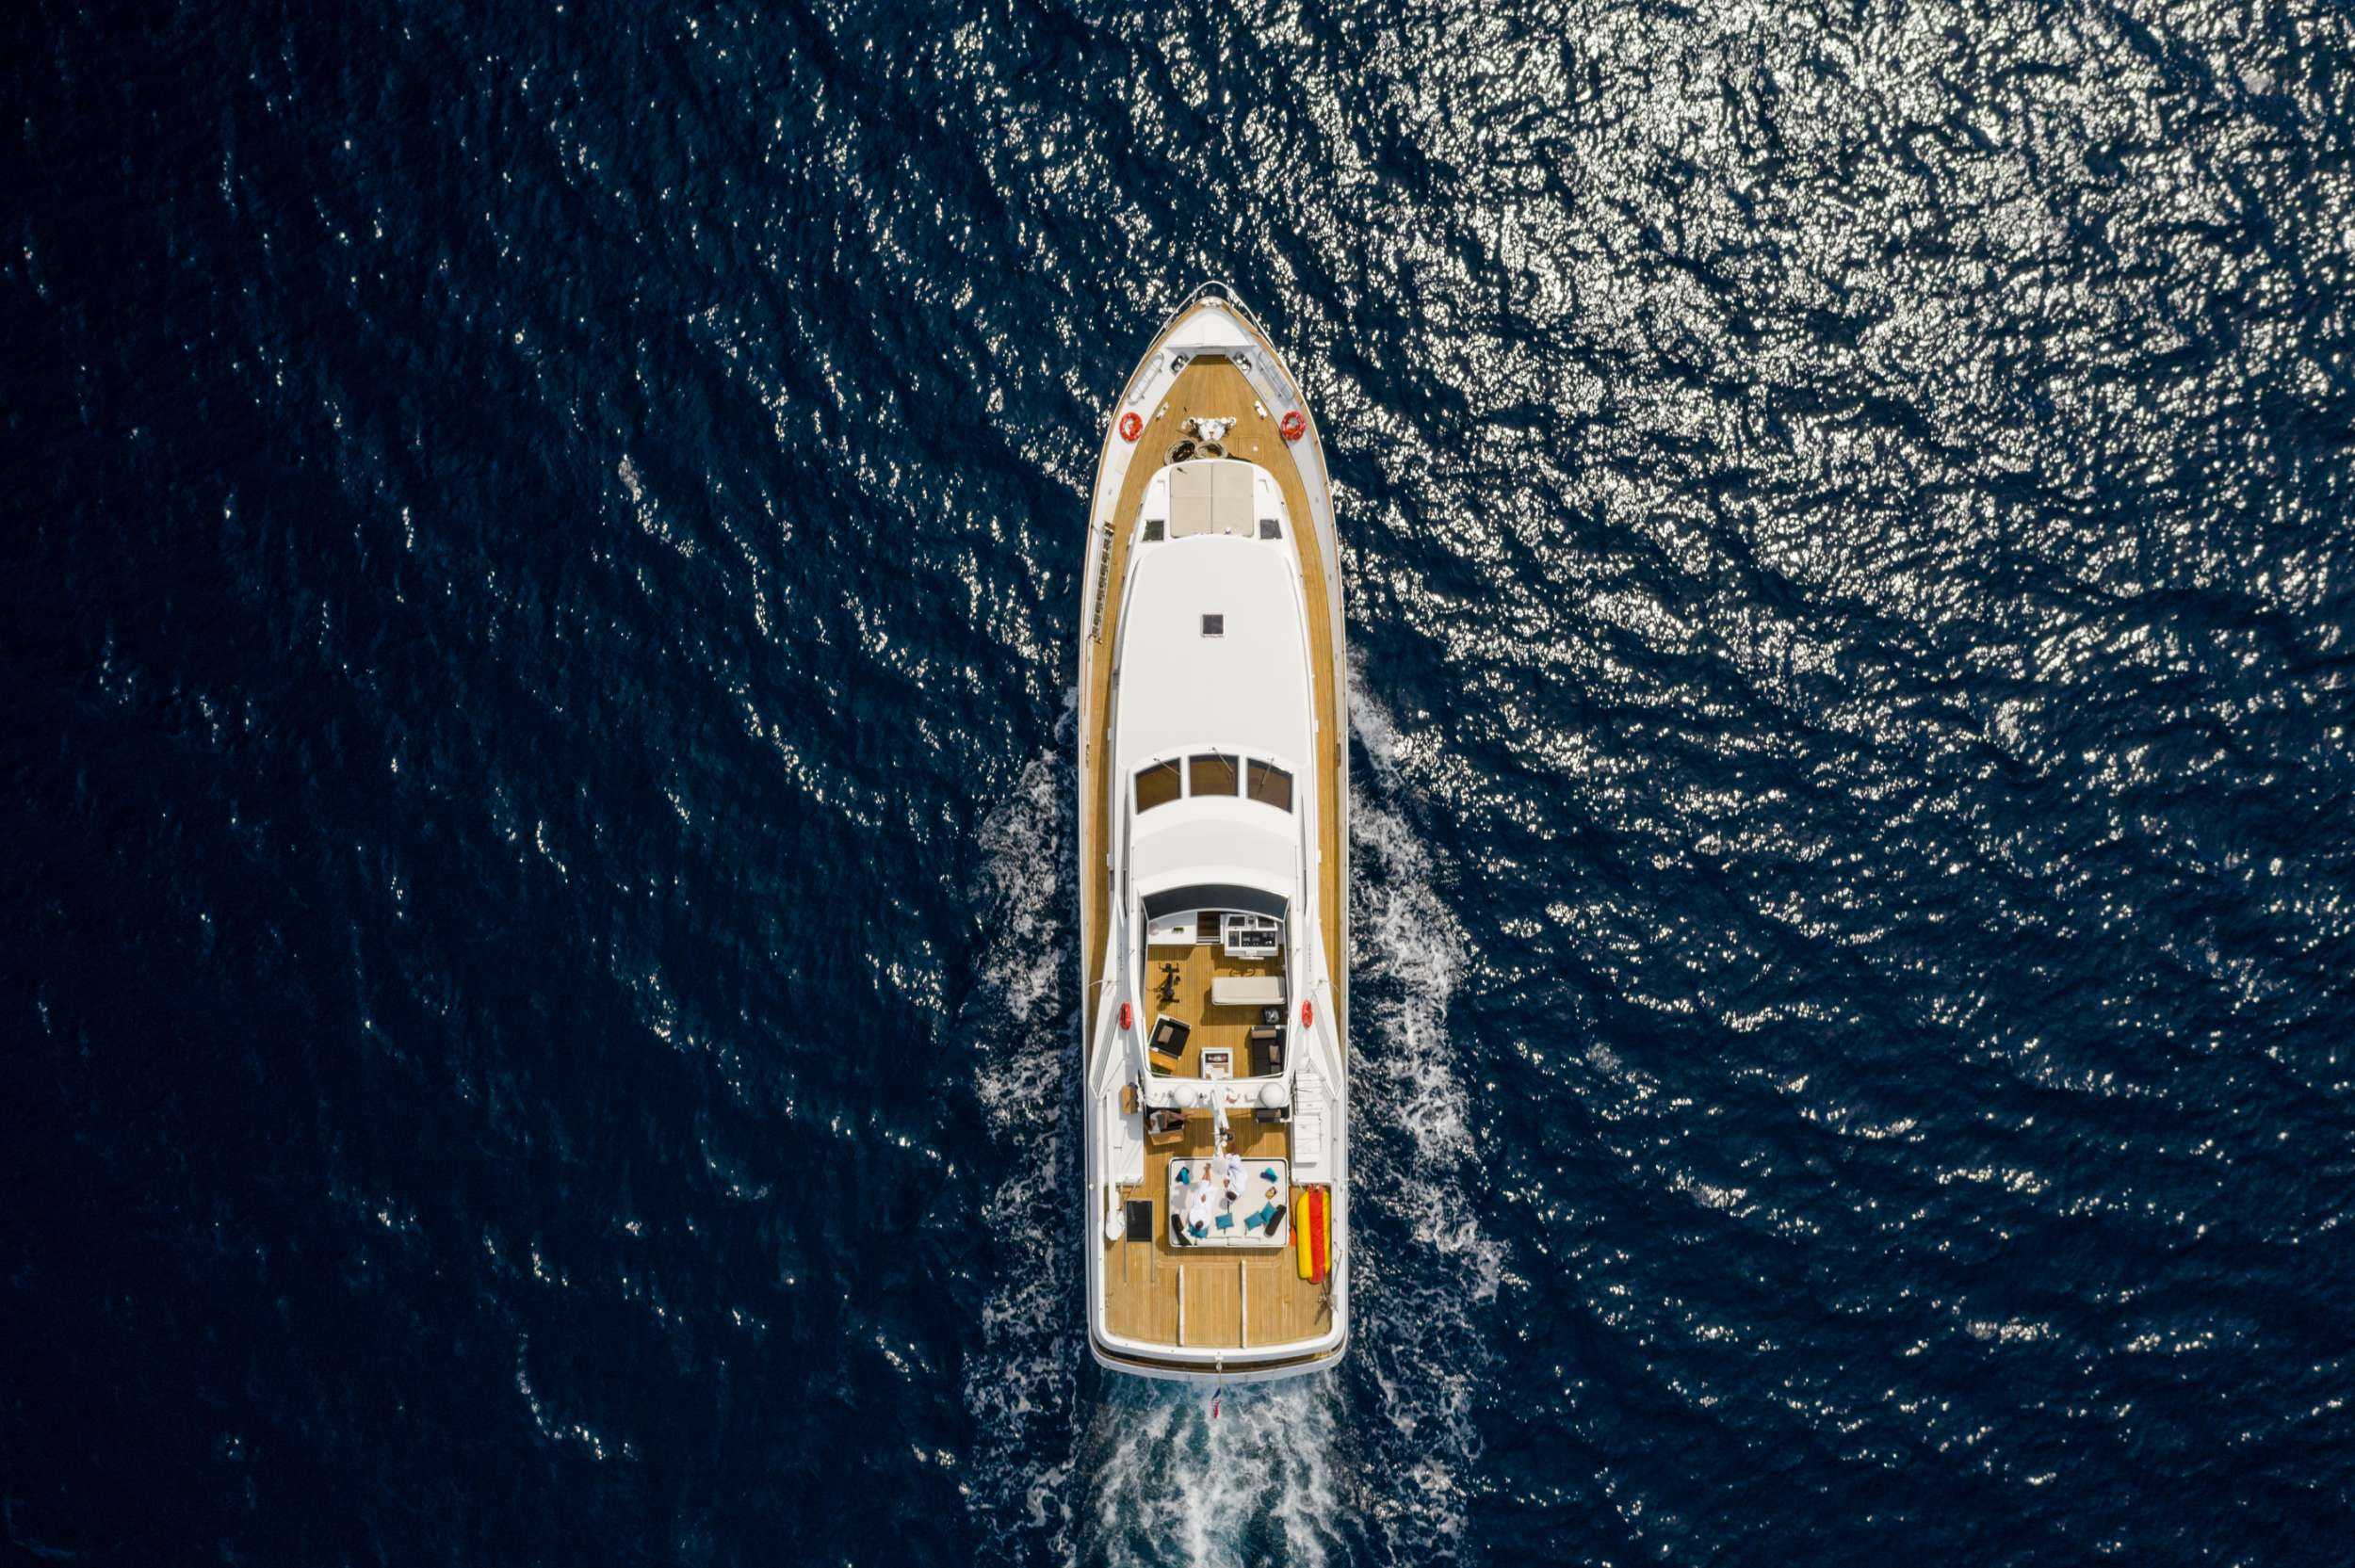 Image of Bora Bora yacht #5